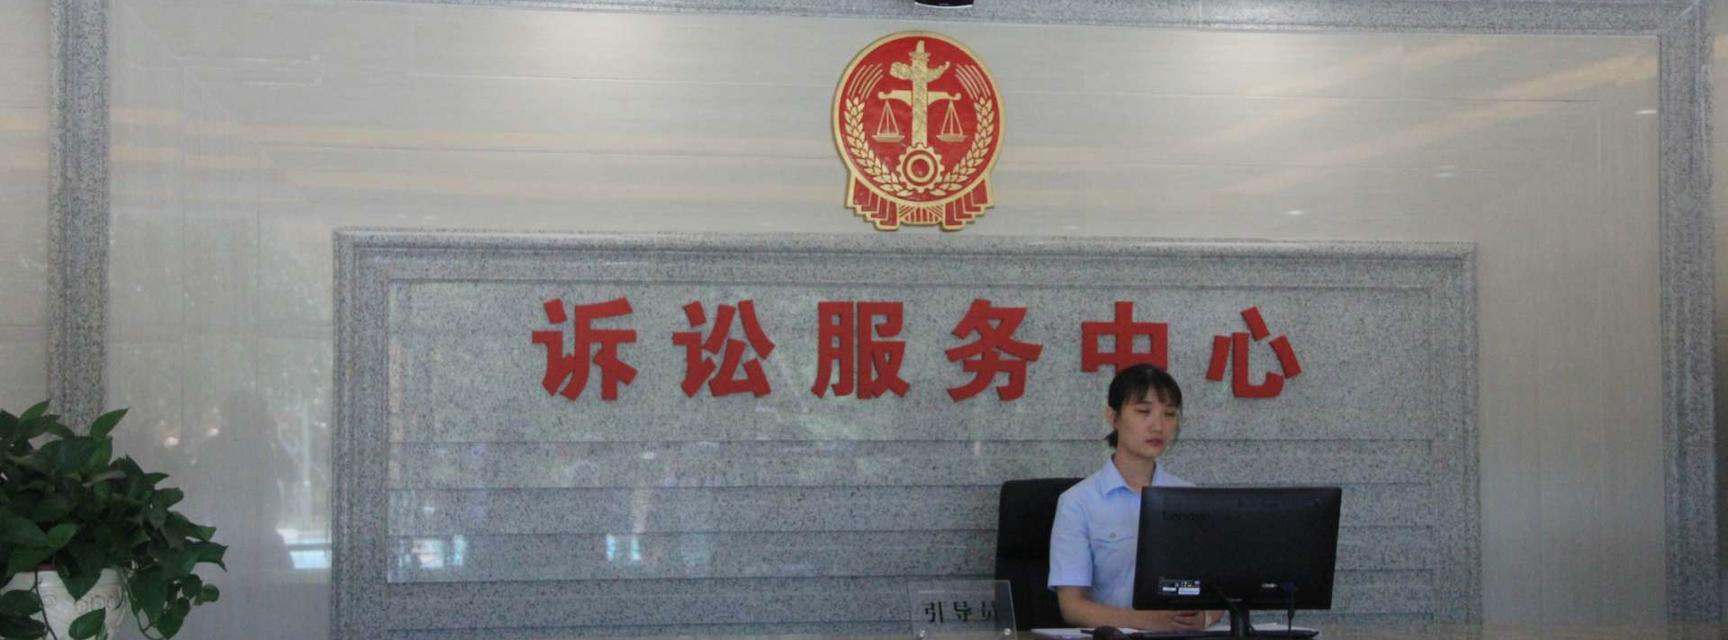 lawsuit service center guiyang